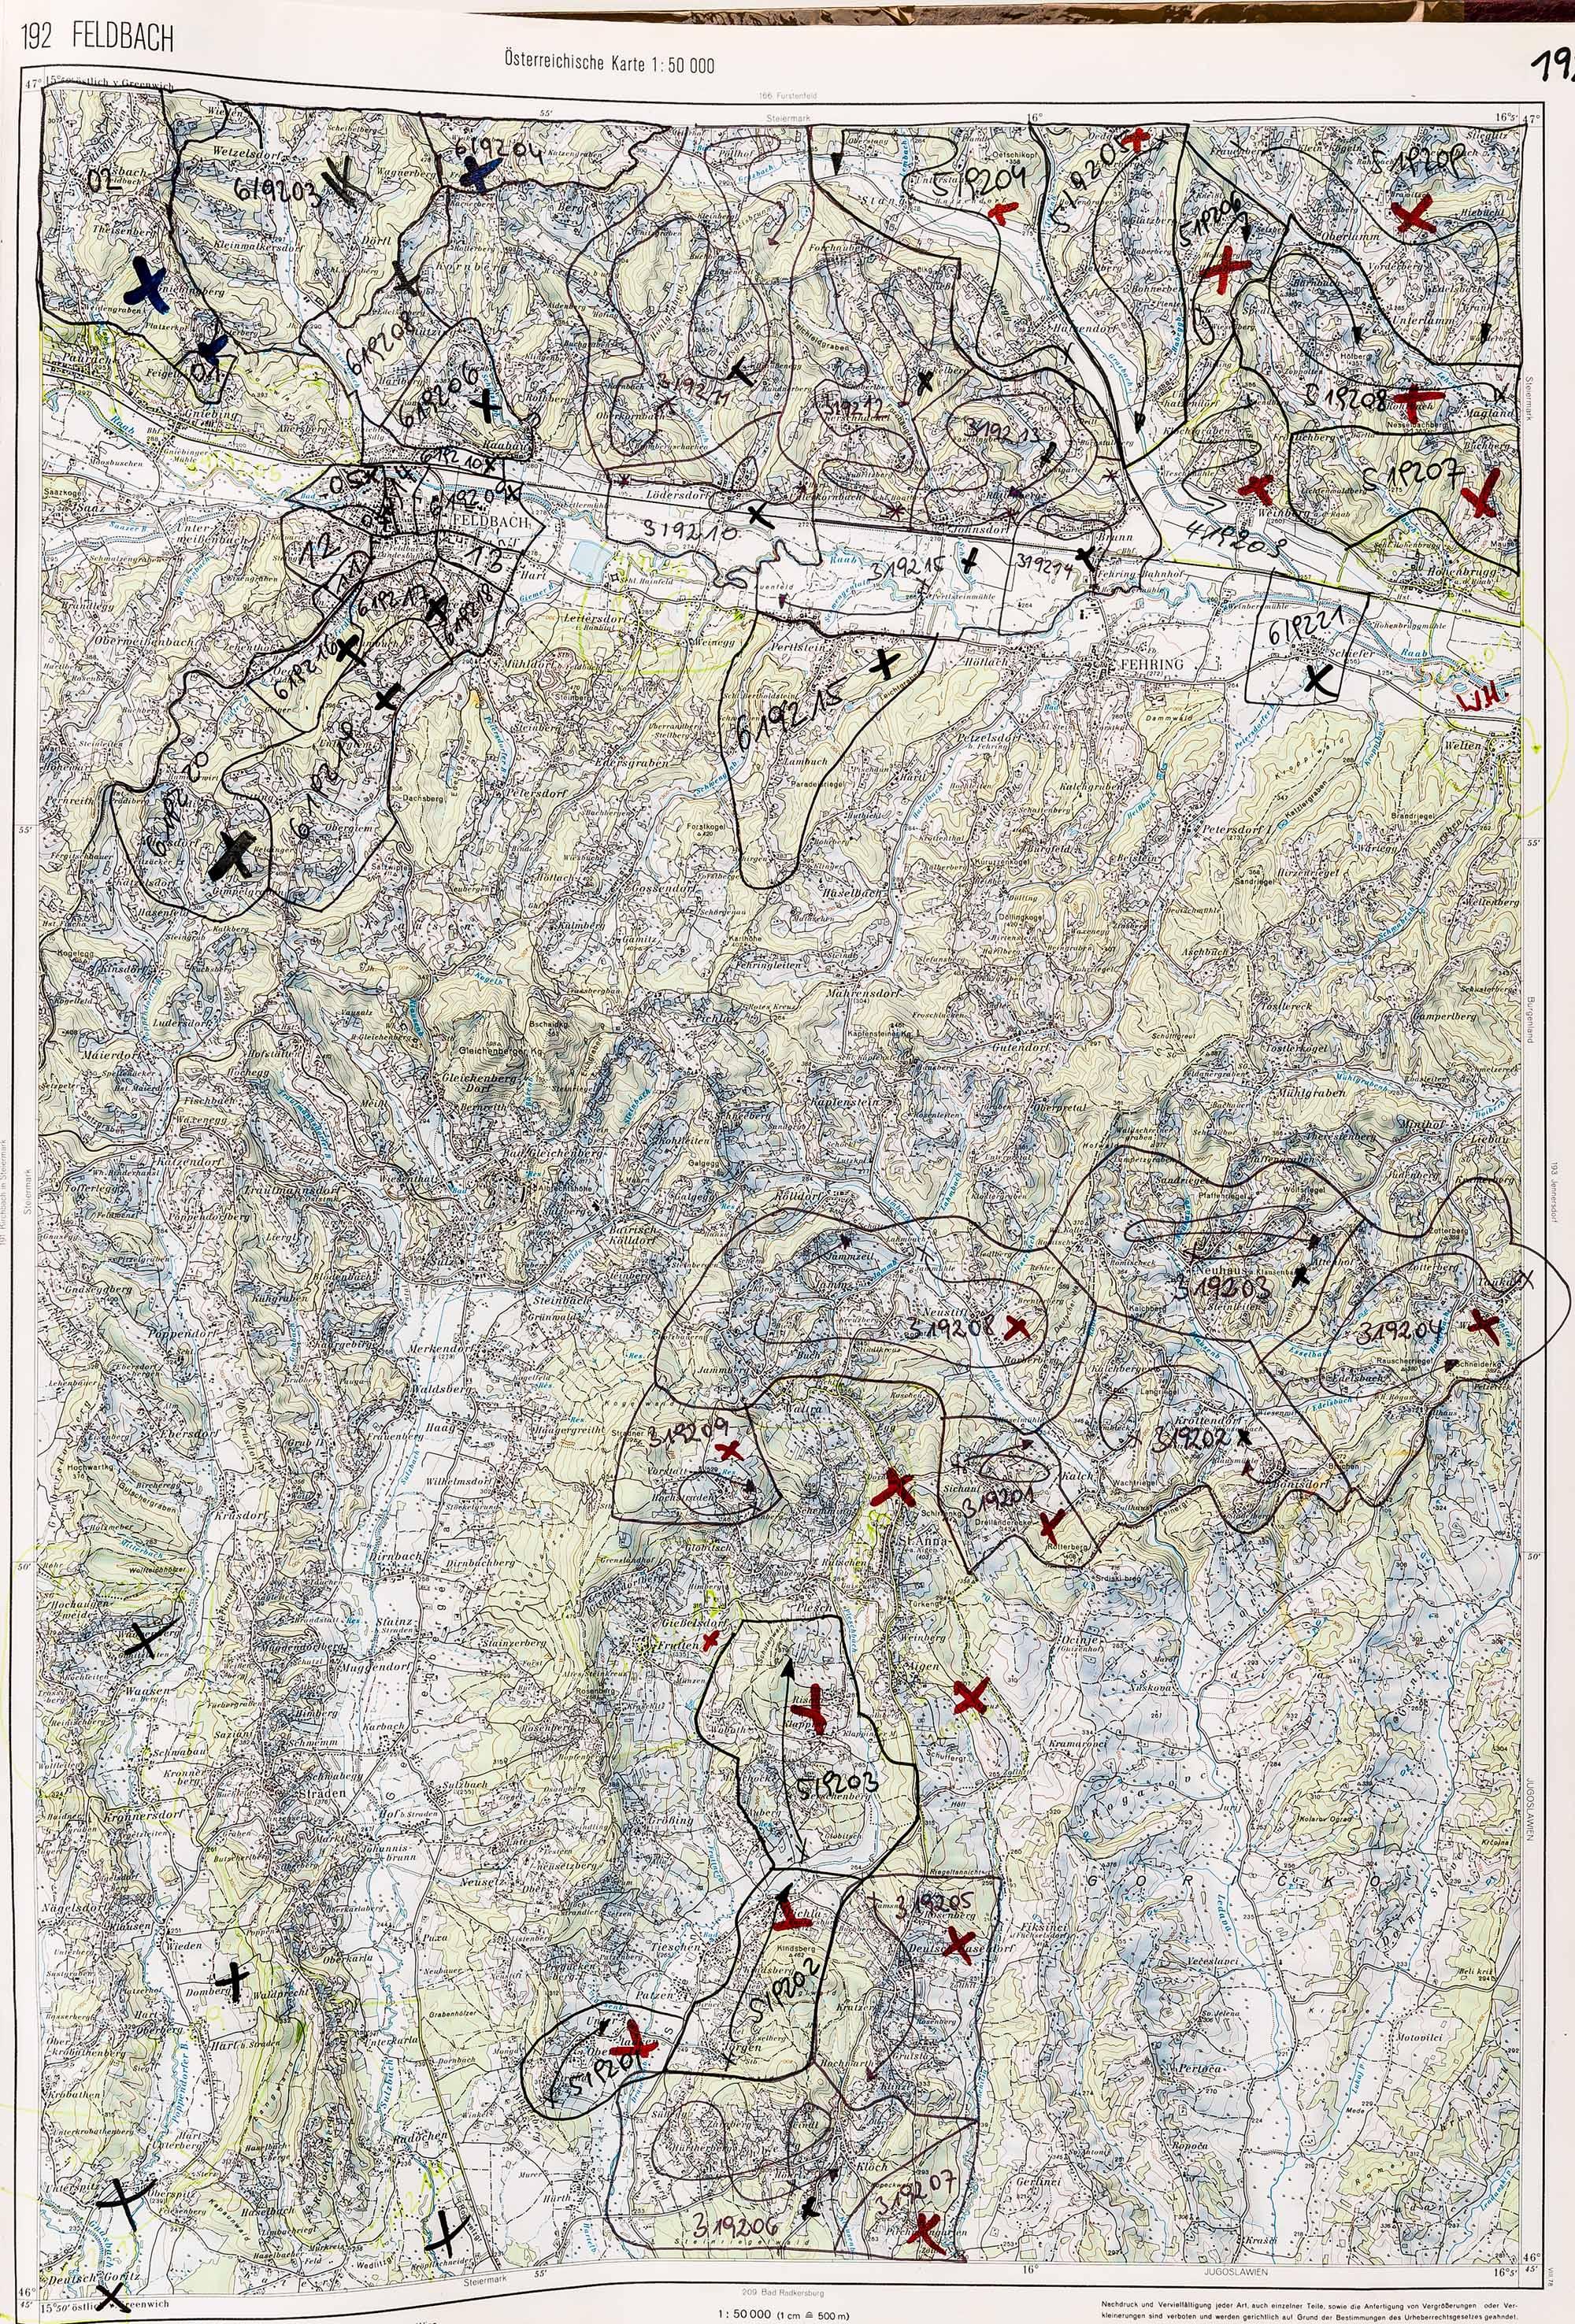 1983-1986 Karte 192